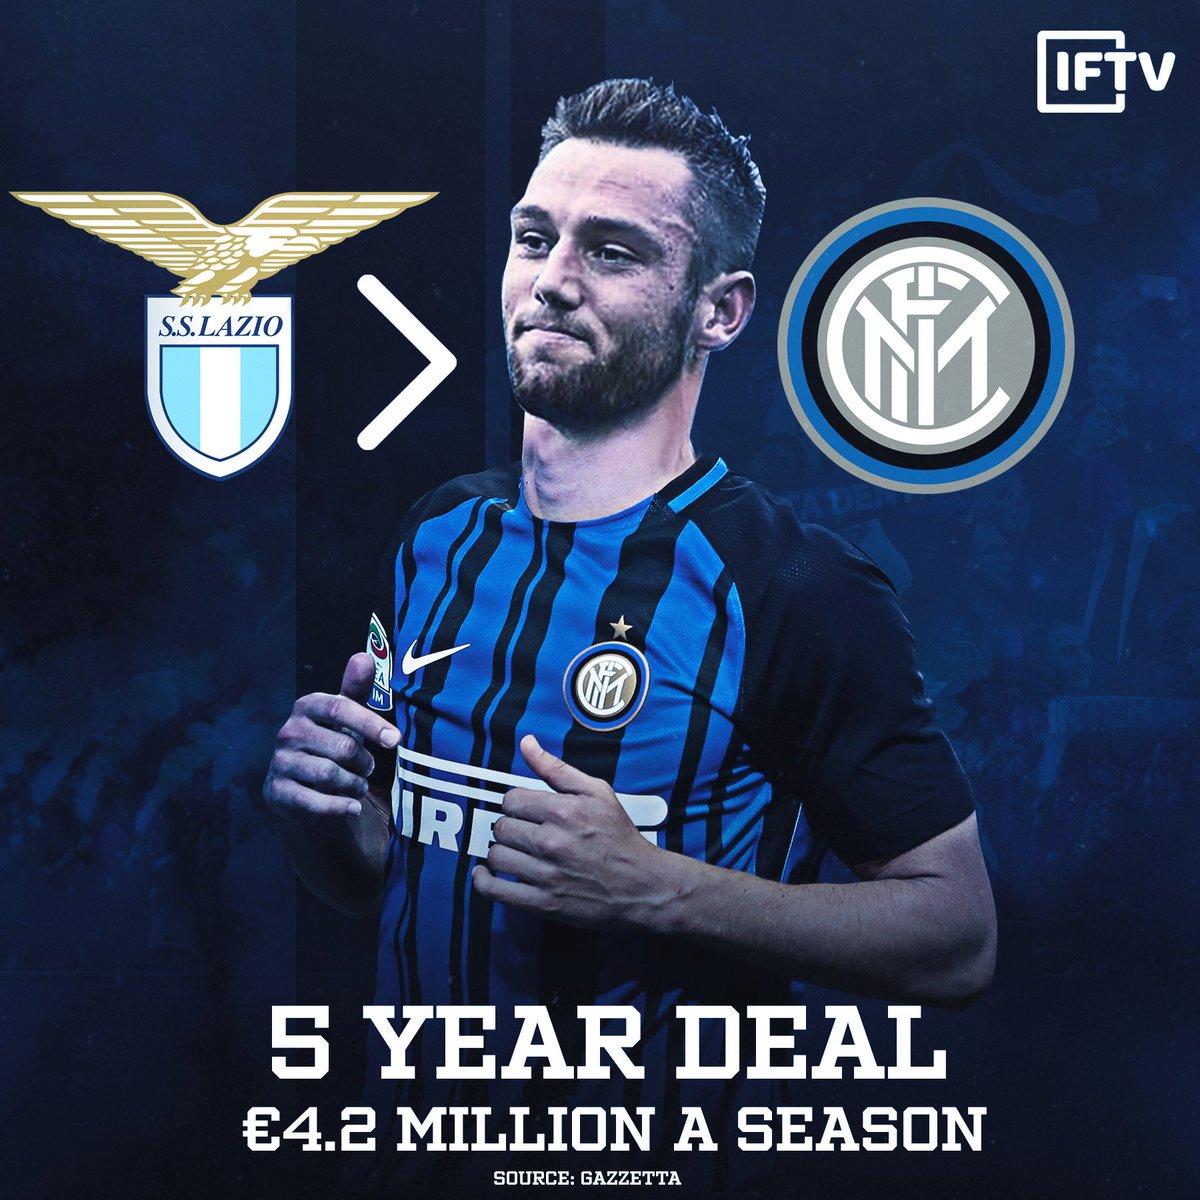 De Vrij to Inter? 👀 https://t.co/ltT8GEXQey